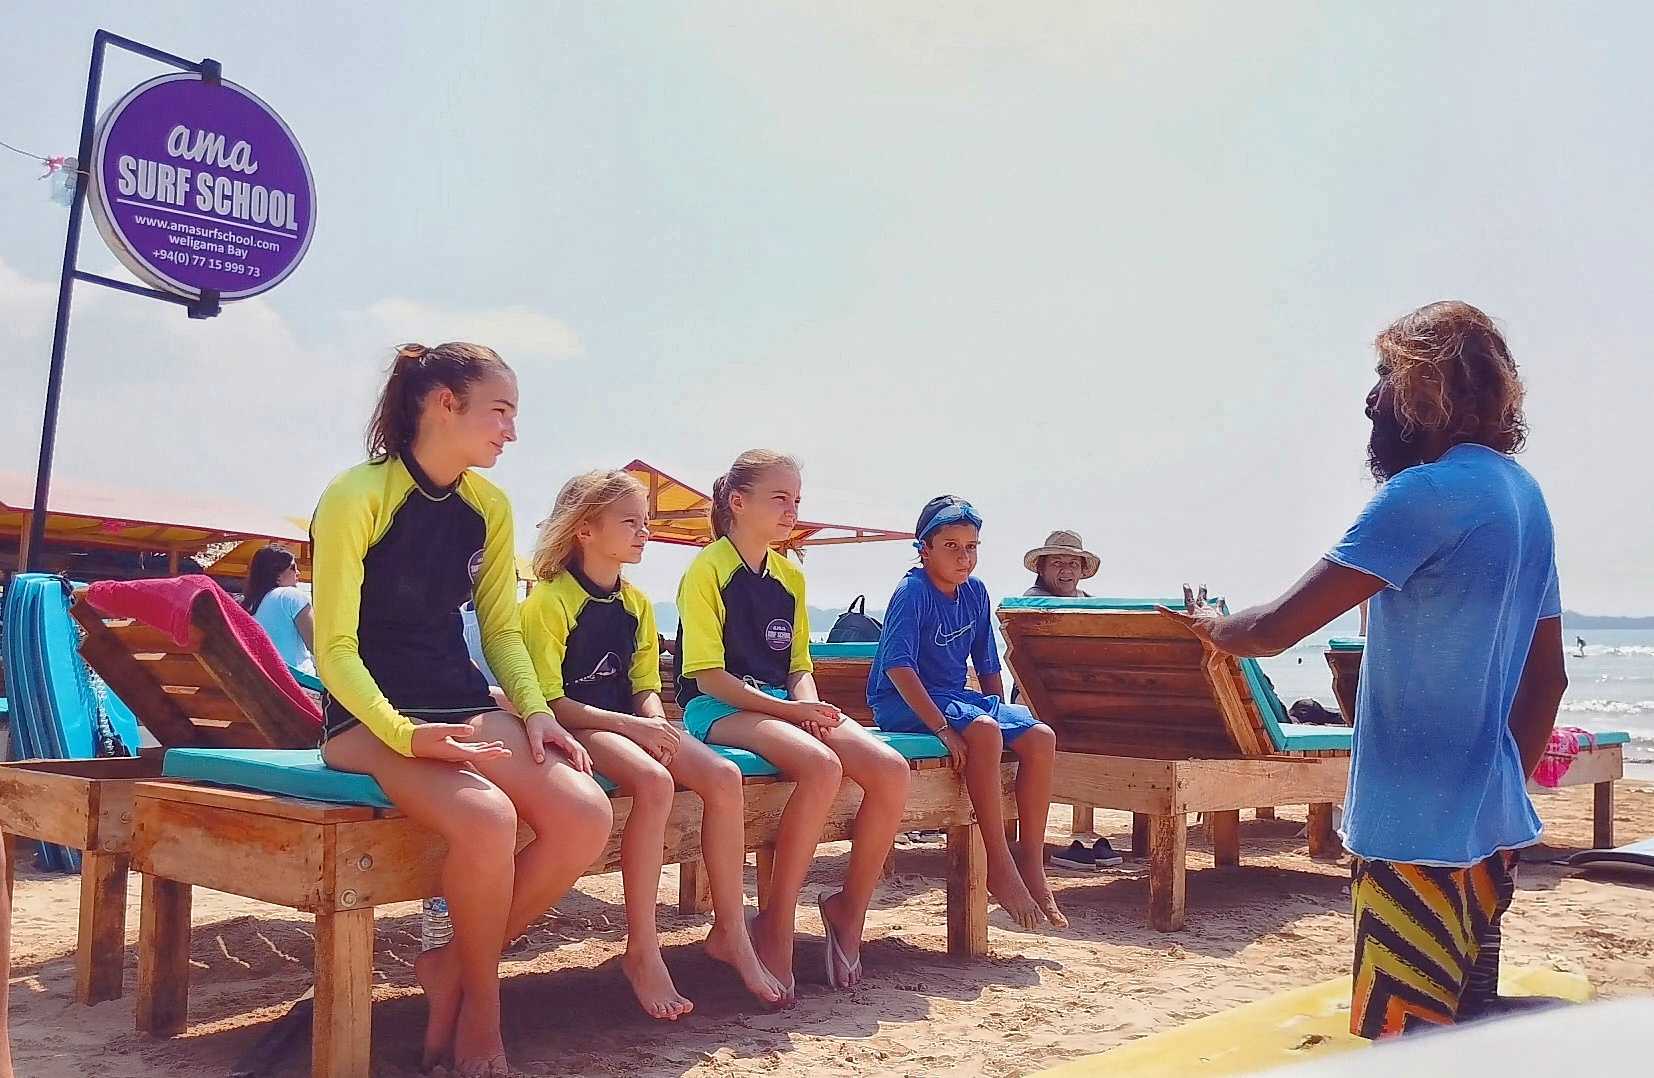 Surfing school Weligama SriLanka